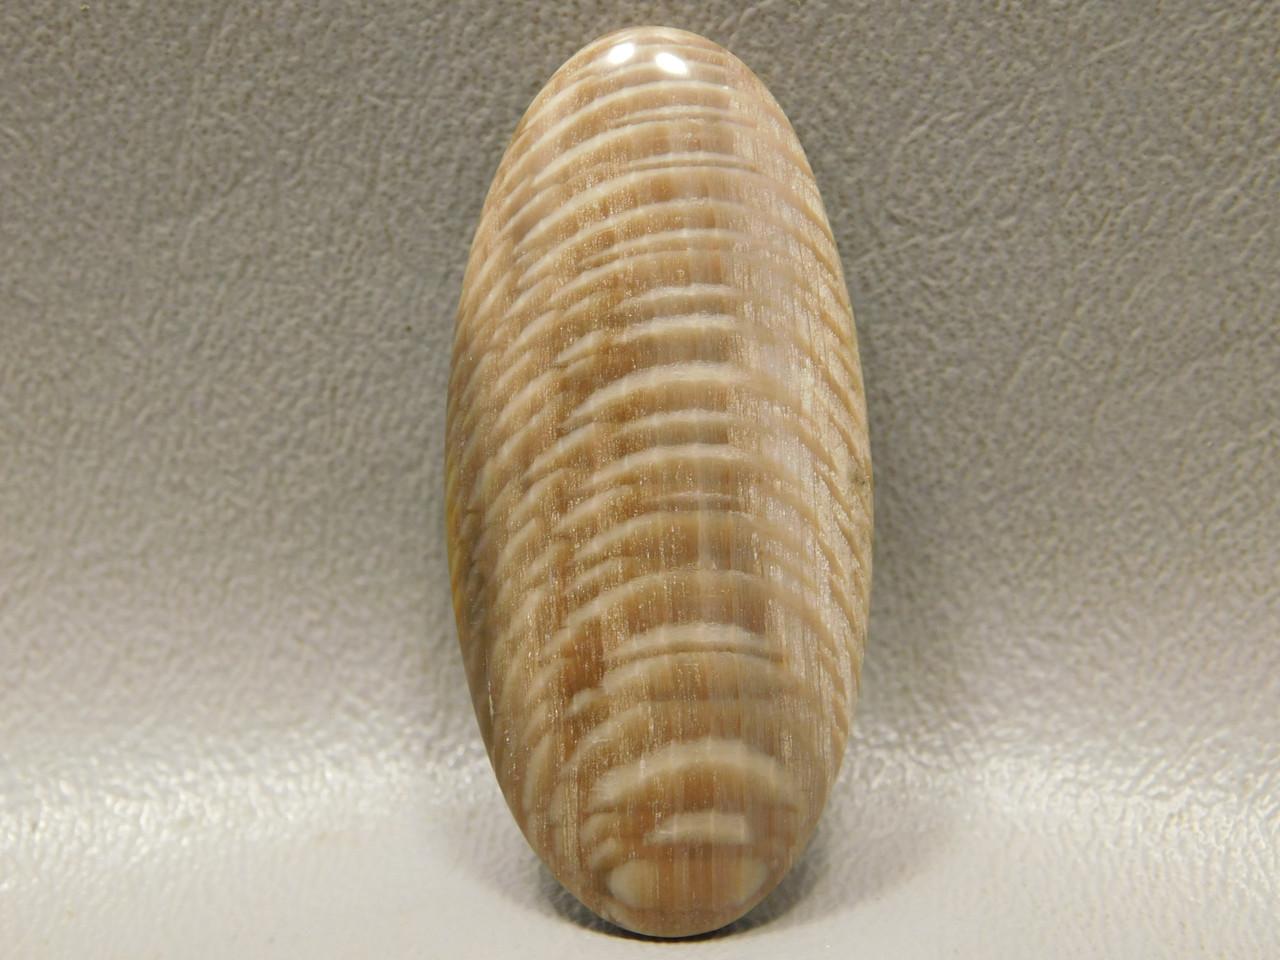 Petrified Sycamore Wood Cabochon Badger Pocket Fossil Wood Stone #6